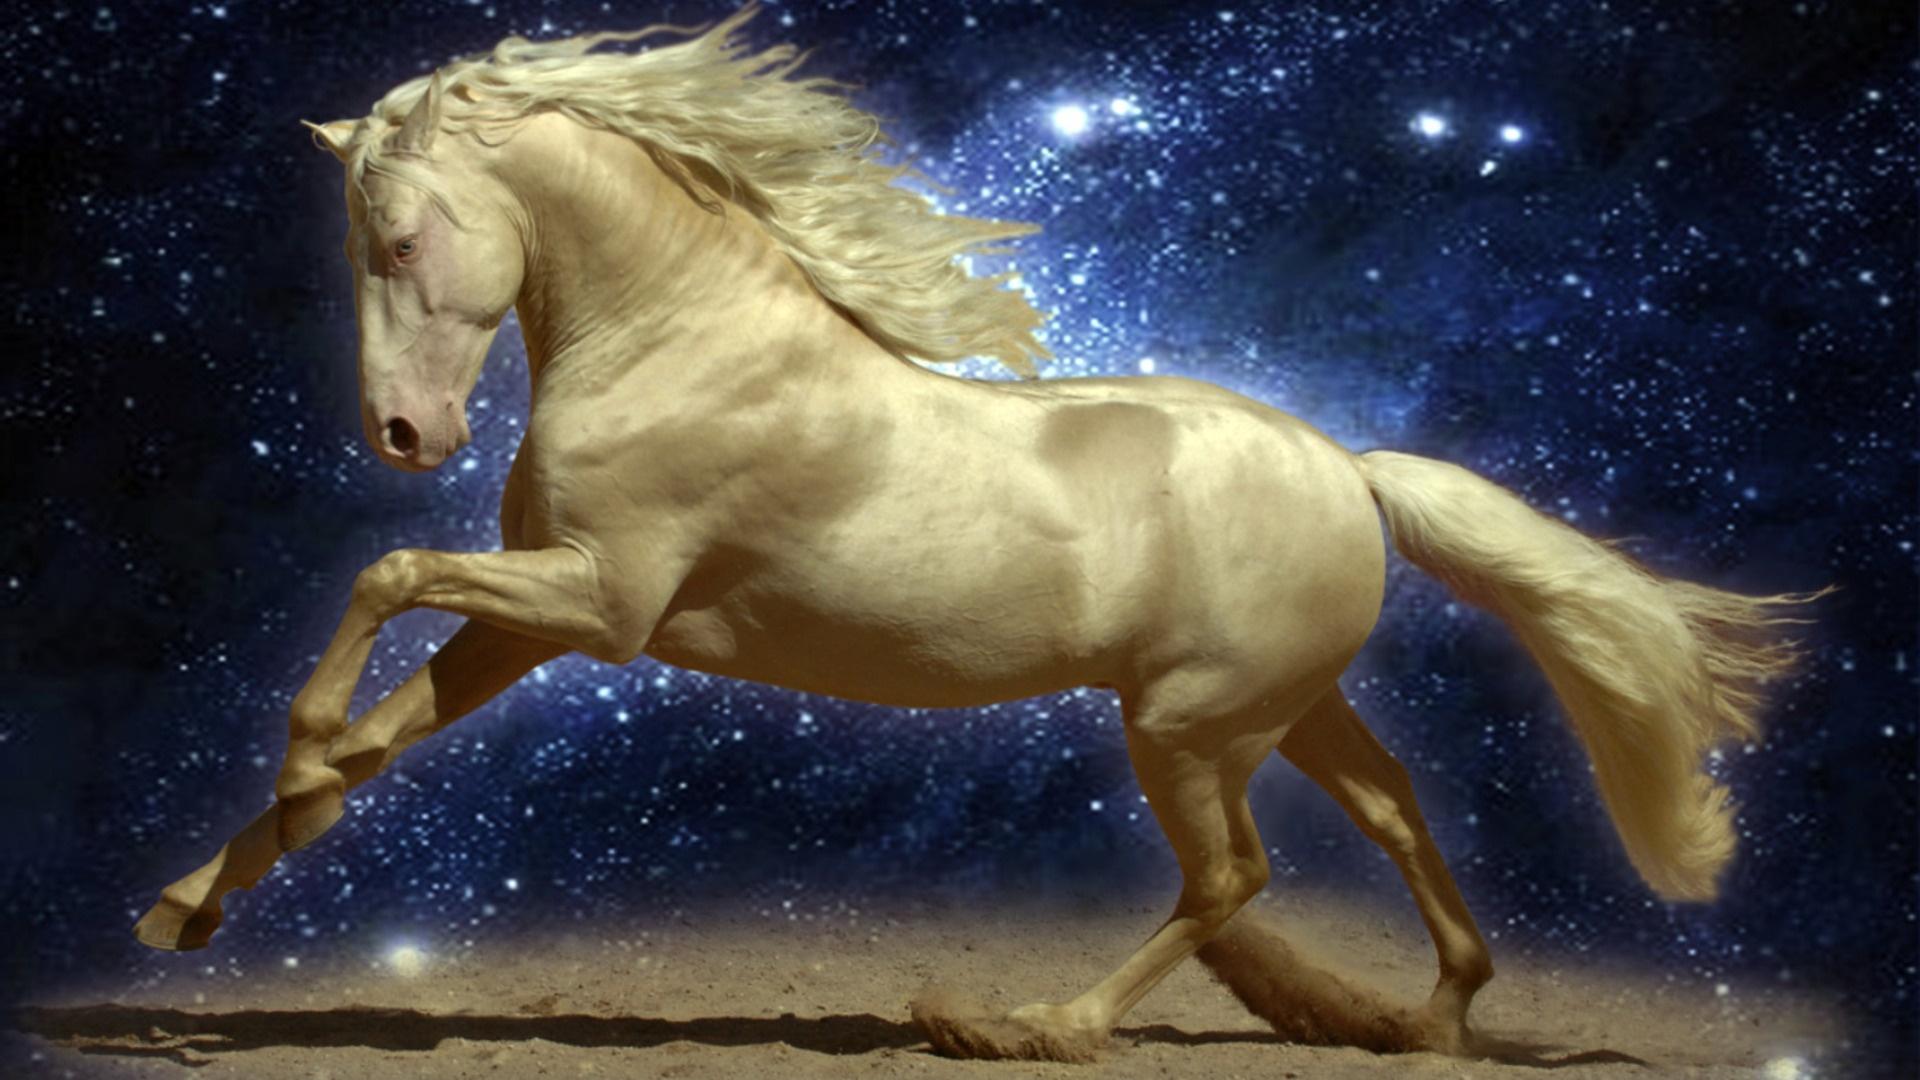 3d horse wallpaper,horse,sky,stallion,mane,organism